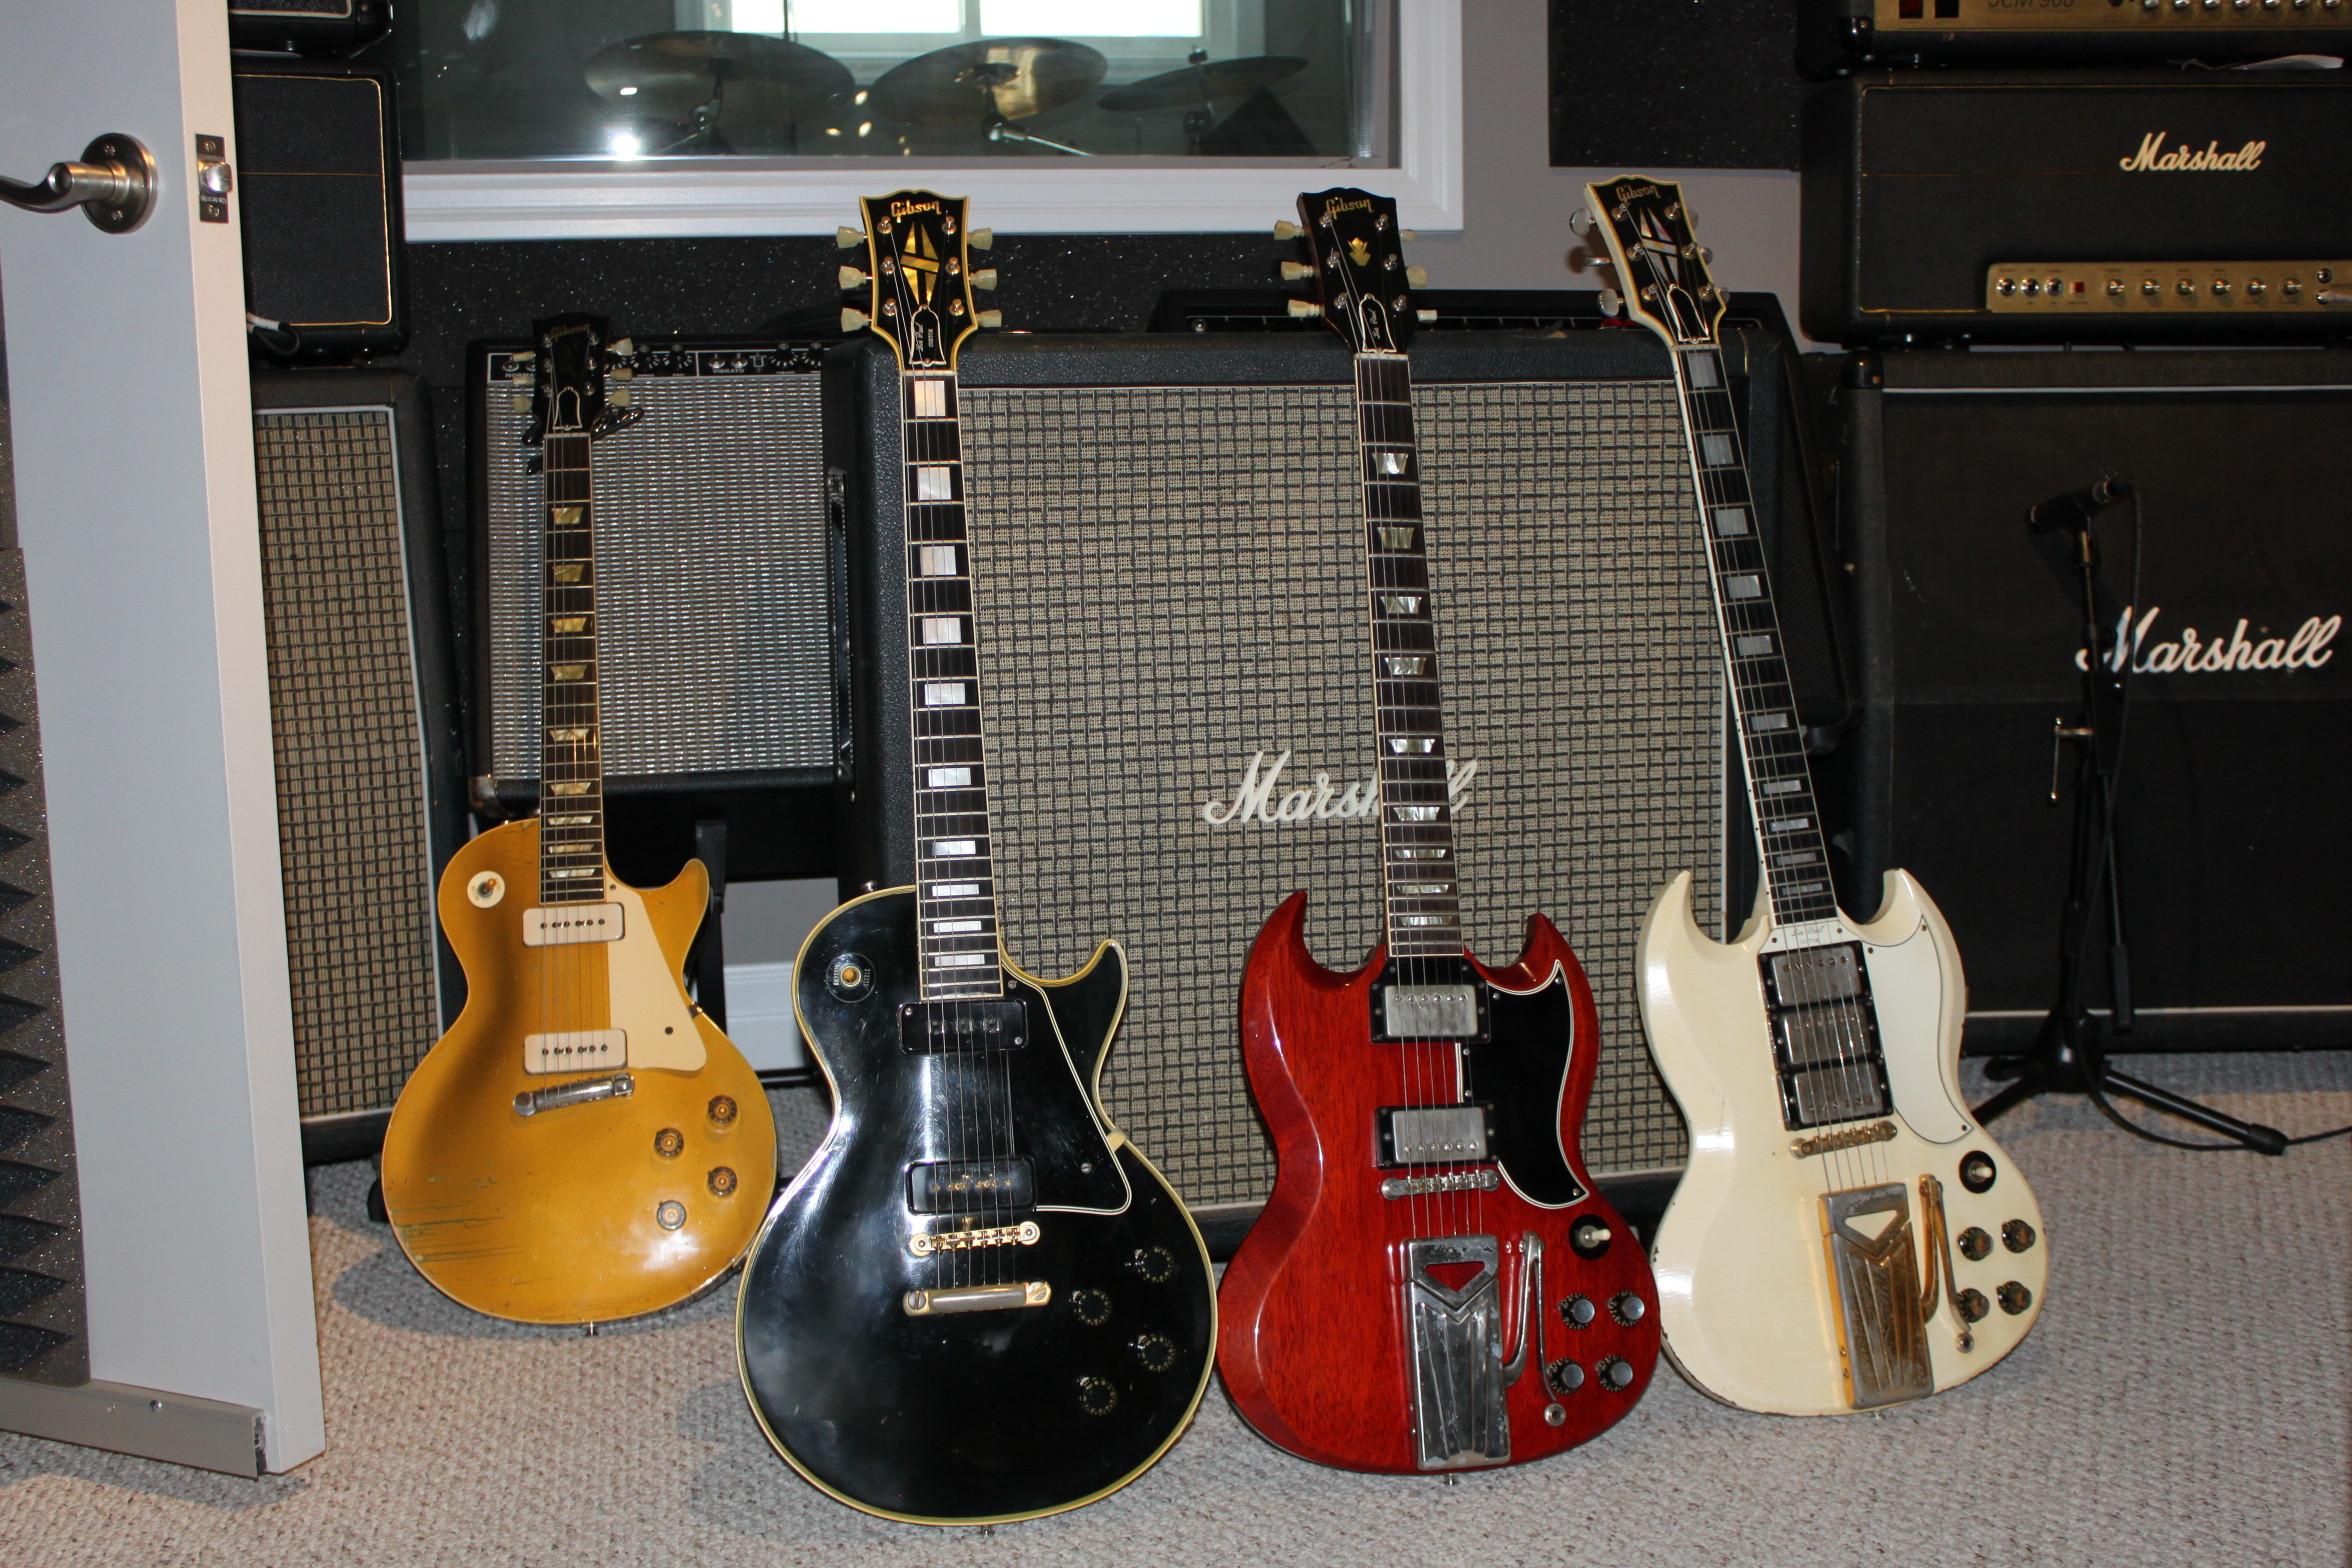 kw guitar collections stephen zurakowsky classical guitarist